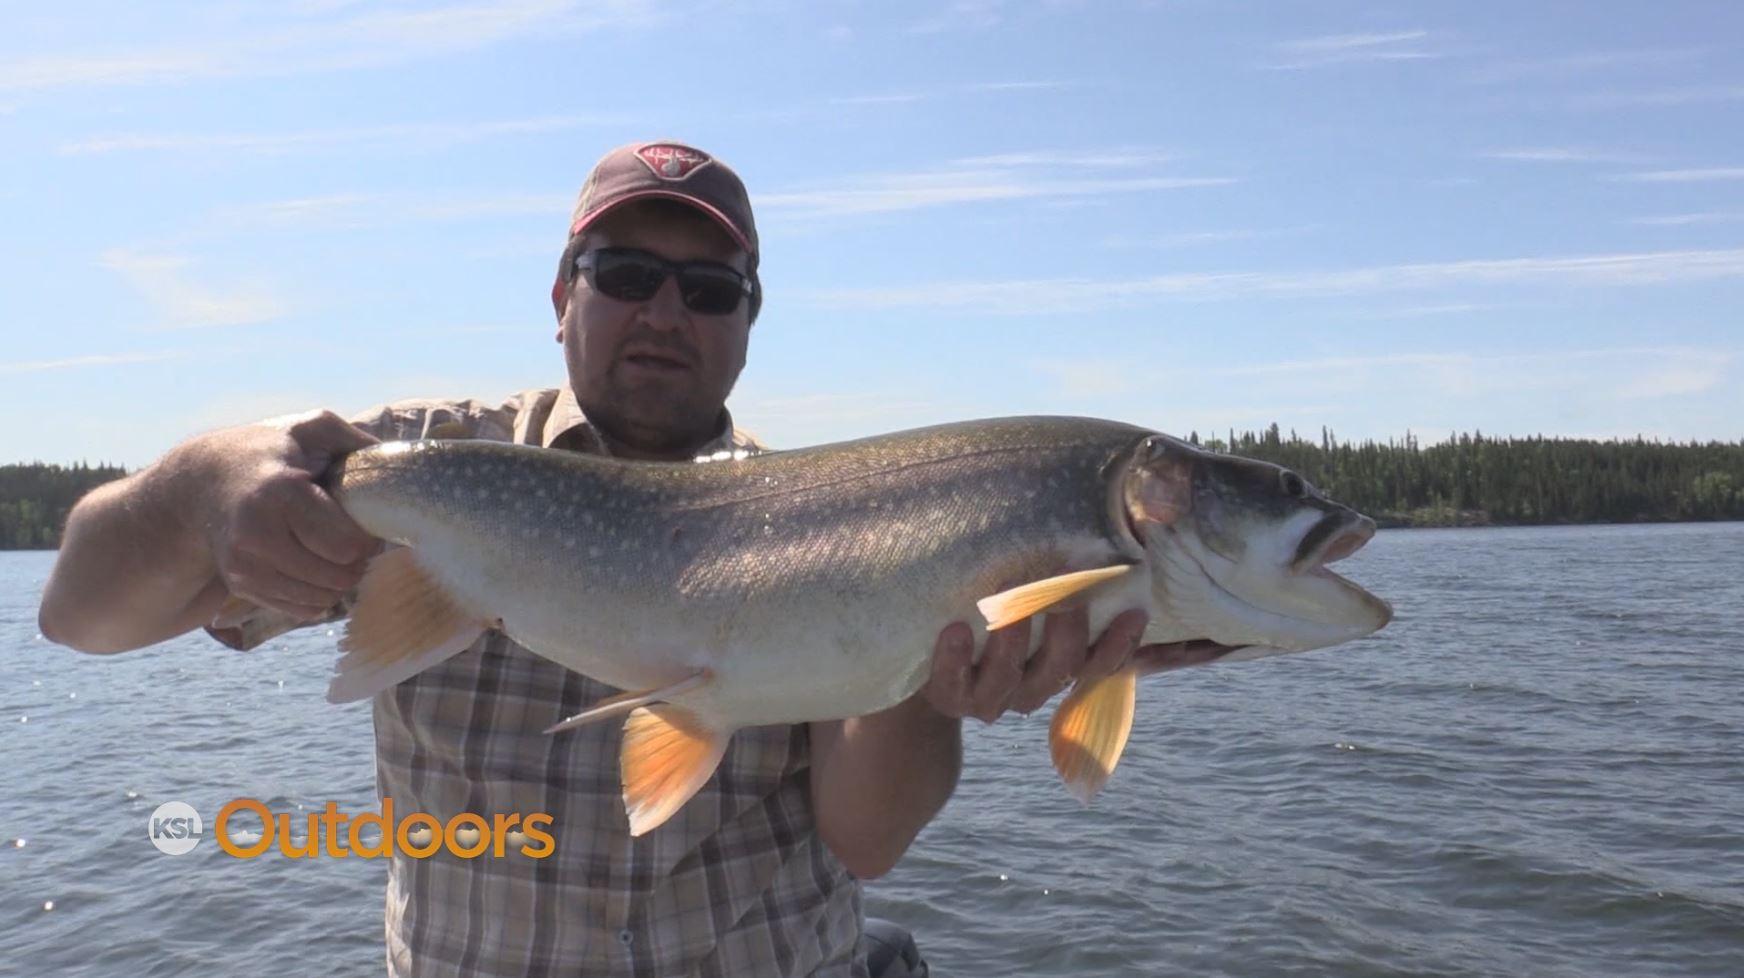 Ksl outdoors fishing at iskwatikan lake lodge part two for Northern utah fishing report